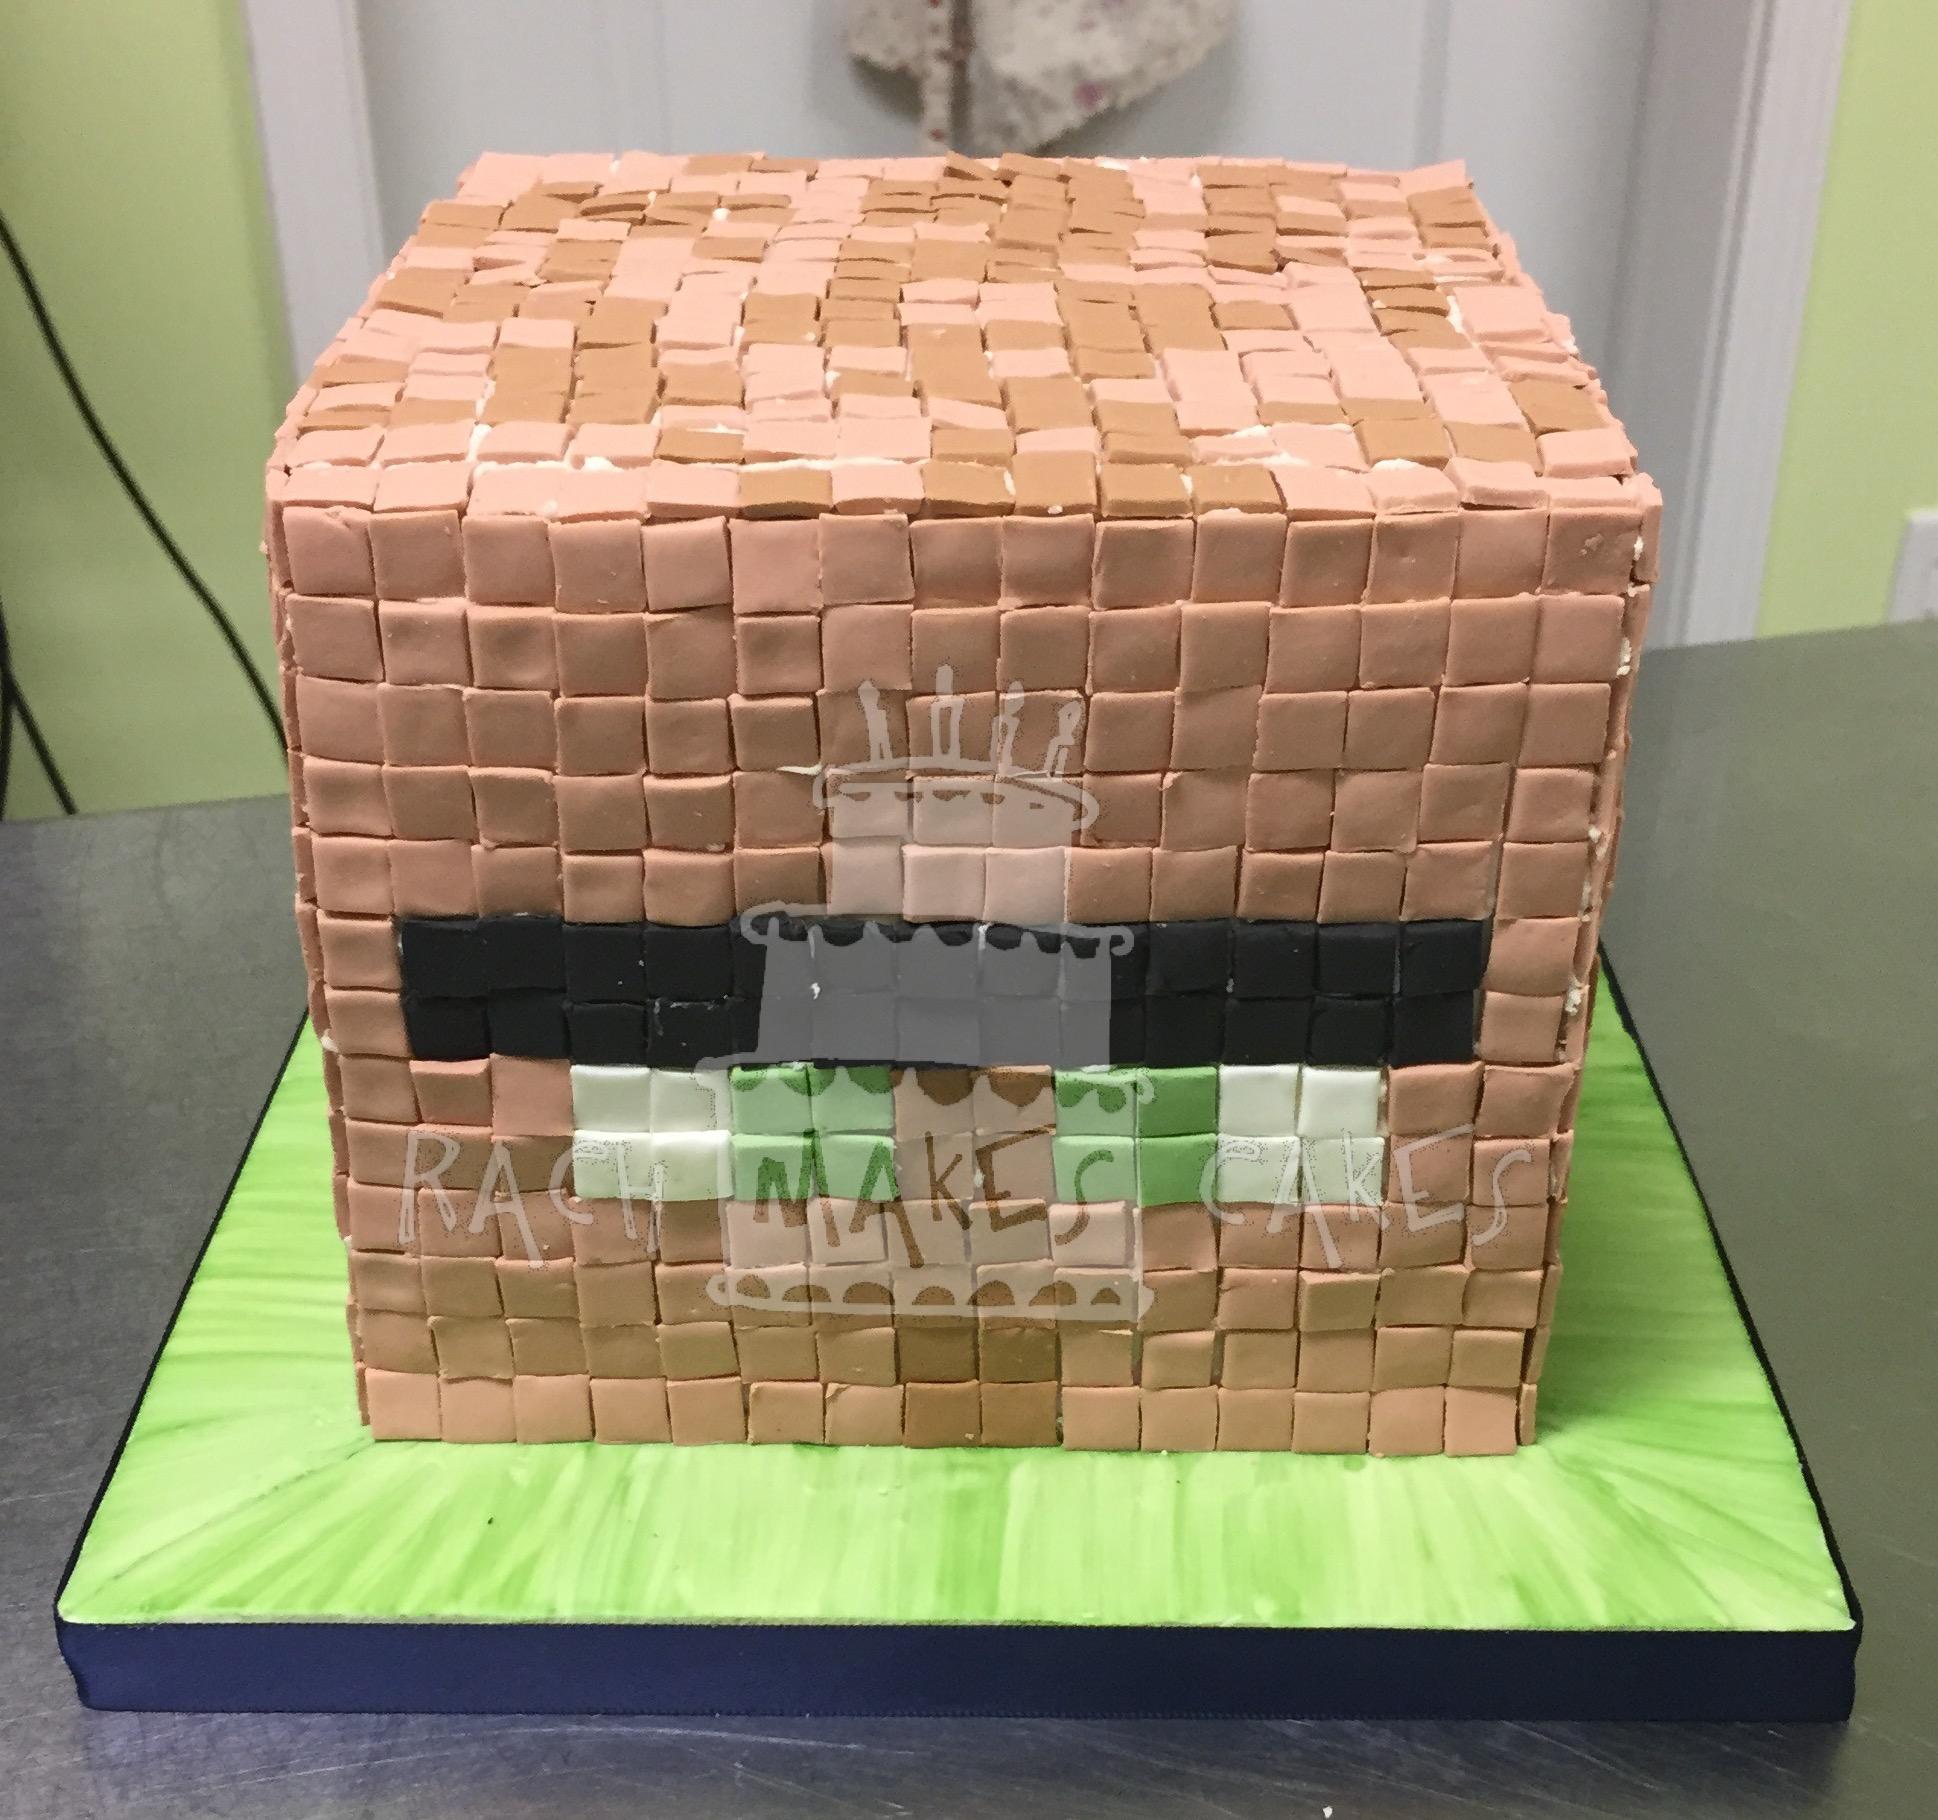 Minecraft Villager Cake Rach Makes Cakes